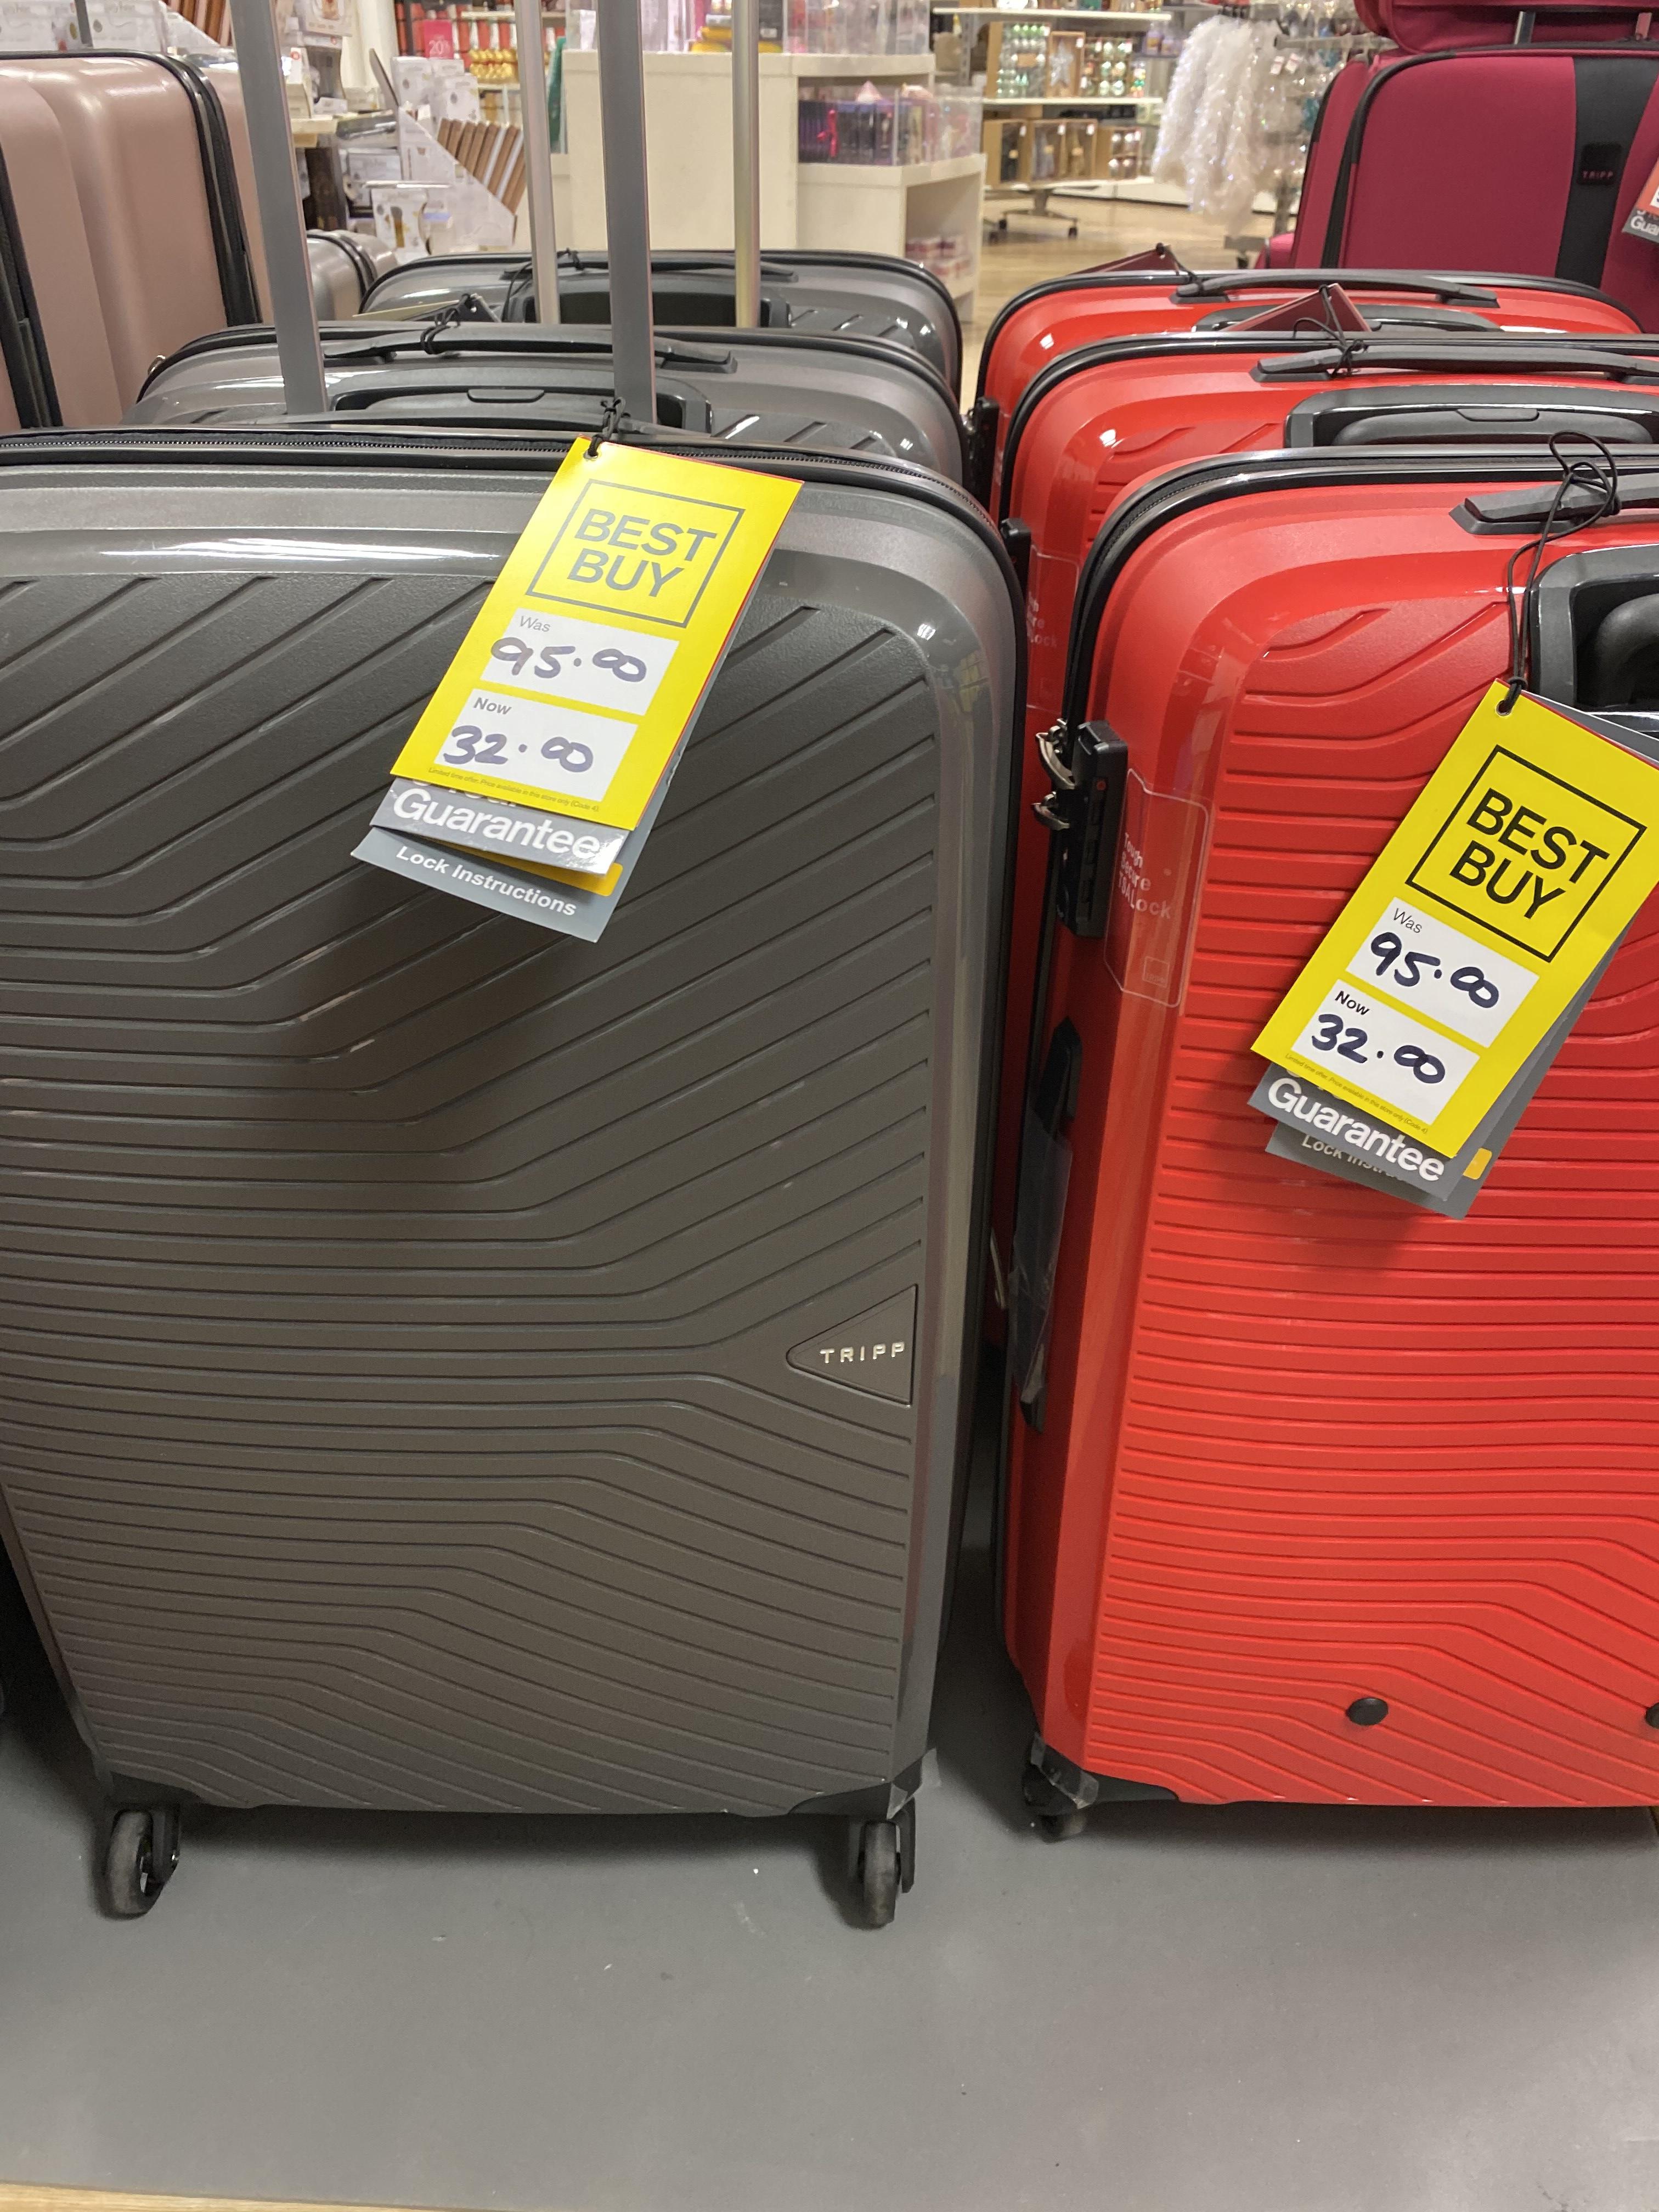 Tripp - Black 'Chic' Medium 4 Wheel Expandable Suitcase 66 litre £32 @ Debenhams (Bedford)